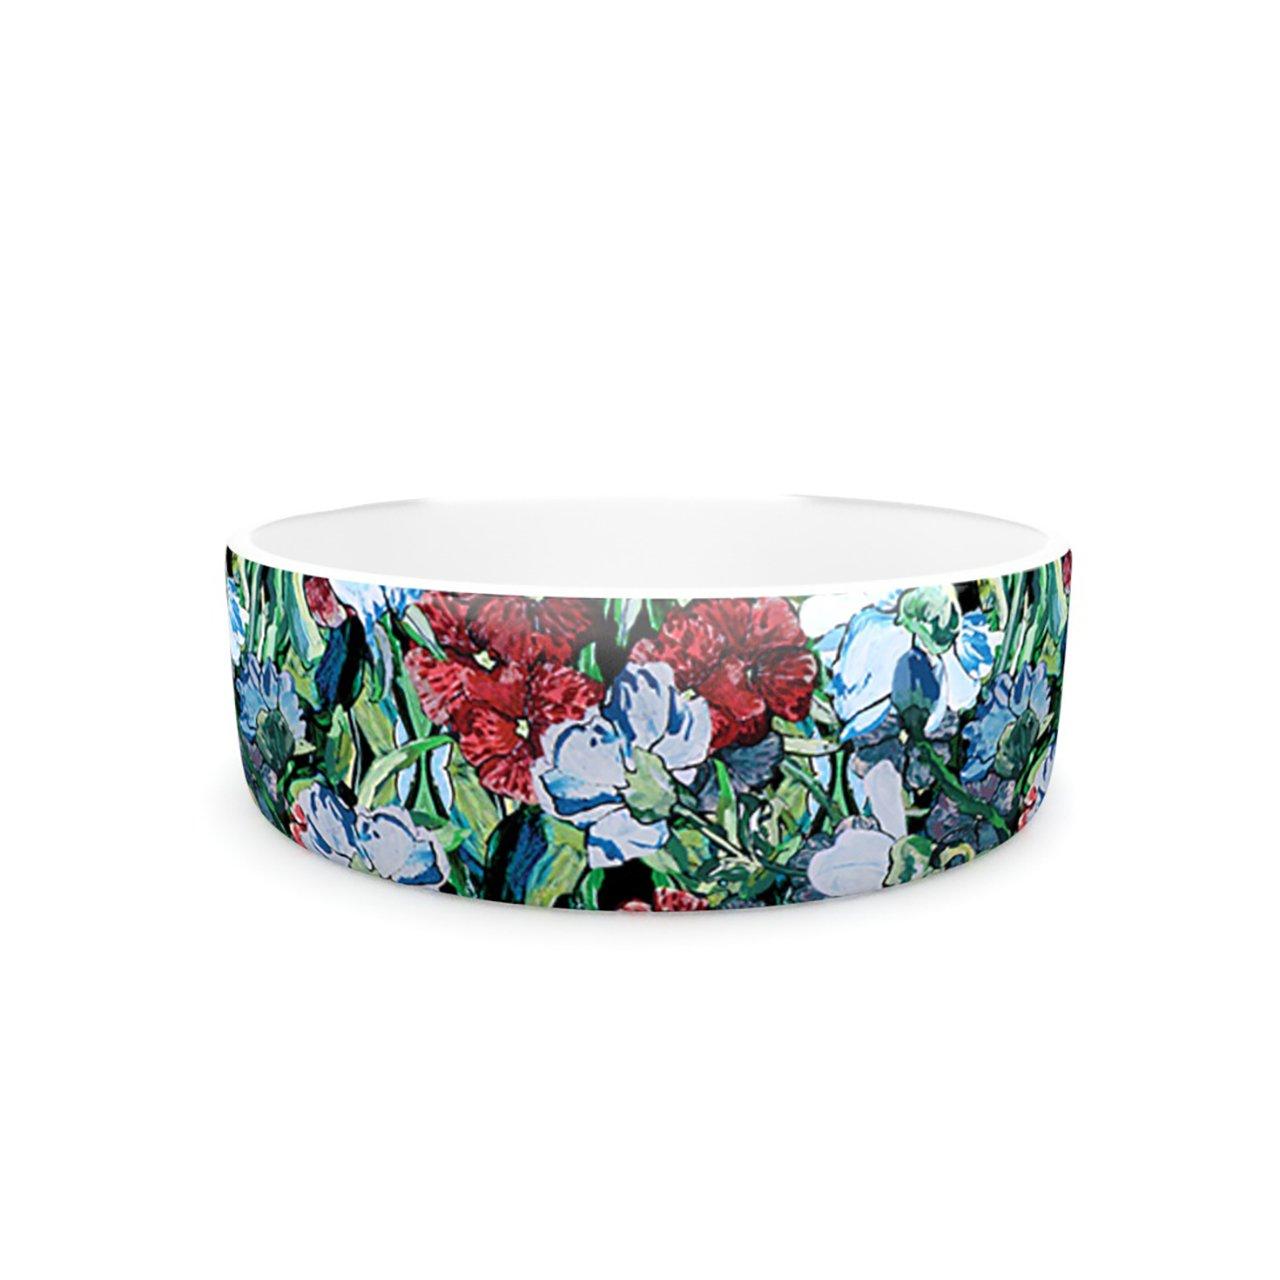 Kess InHouse DLKG Design Giardino  Pet Bowl, 7-Inch, Garden Flowers